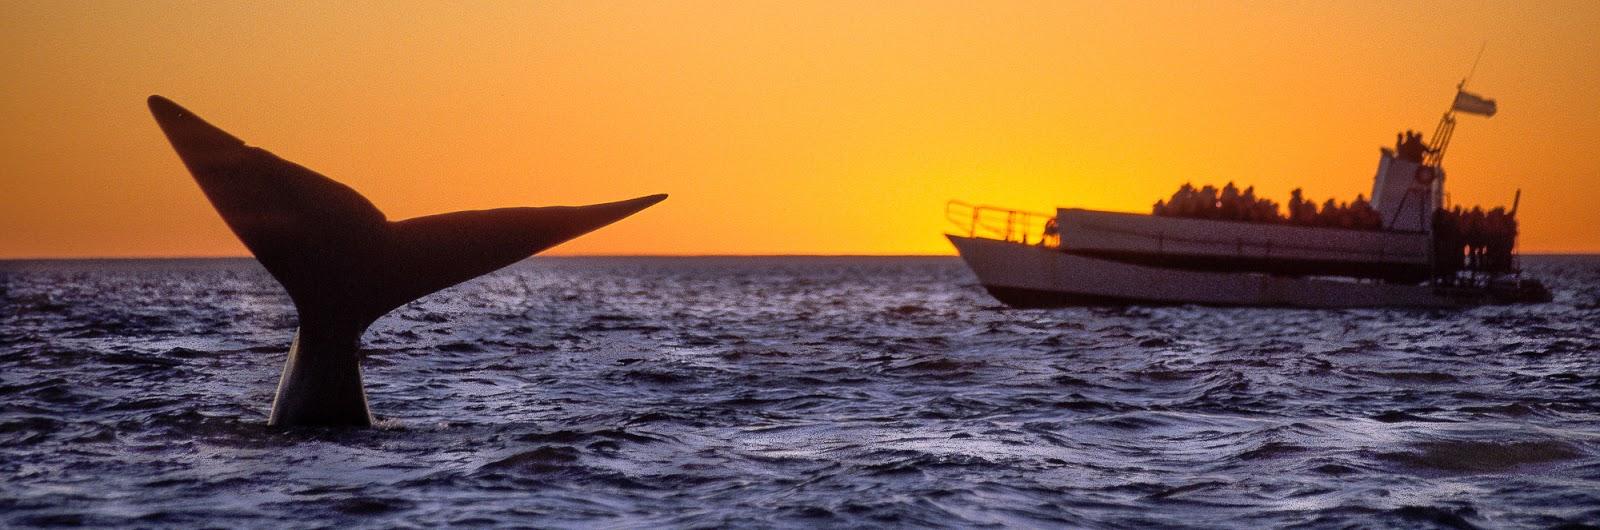 avistaje de ballena en Puerto Piramides Peninsula Valdes